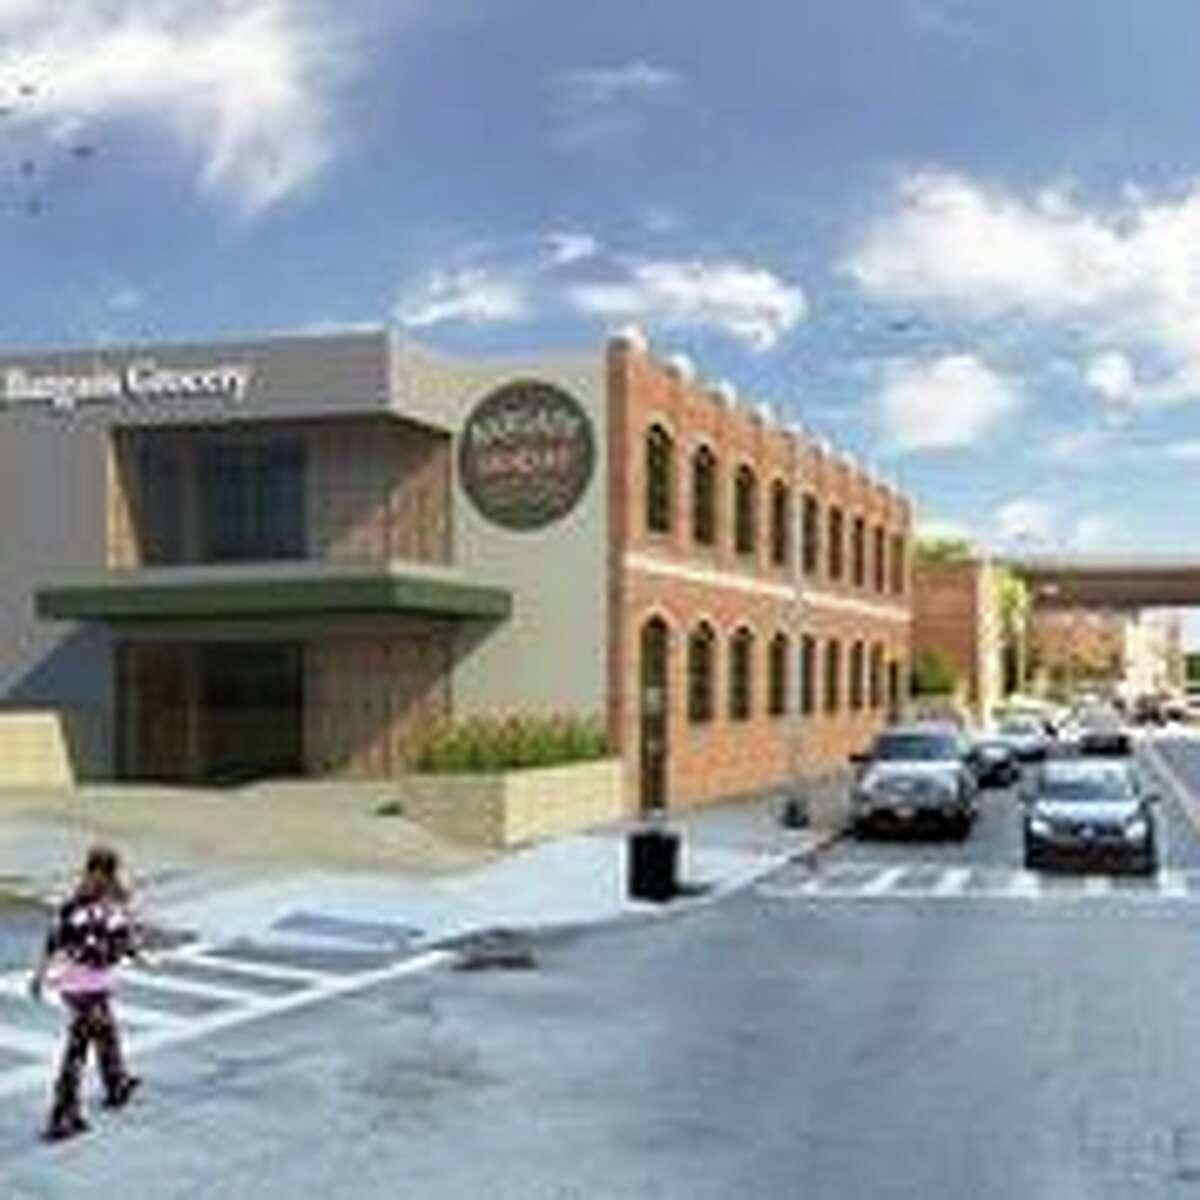 Rendering of proposed Bargain Grocery building at 558 River St. in Troy N.Y